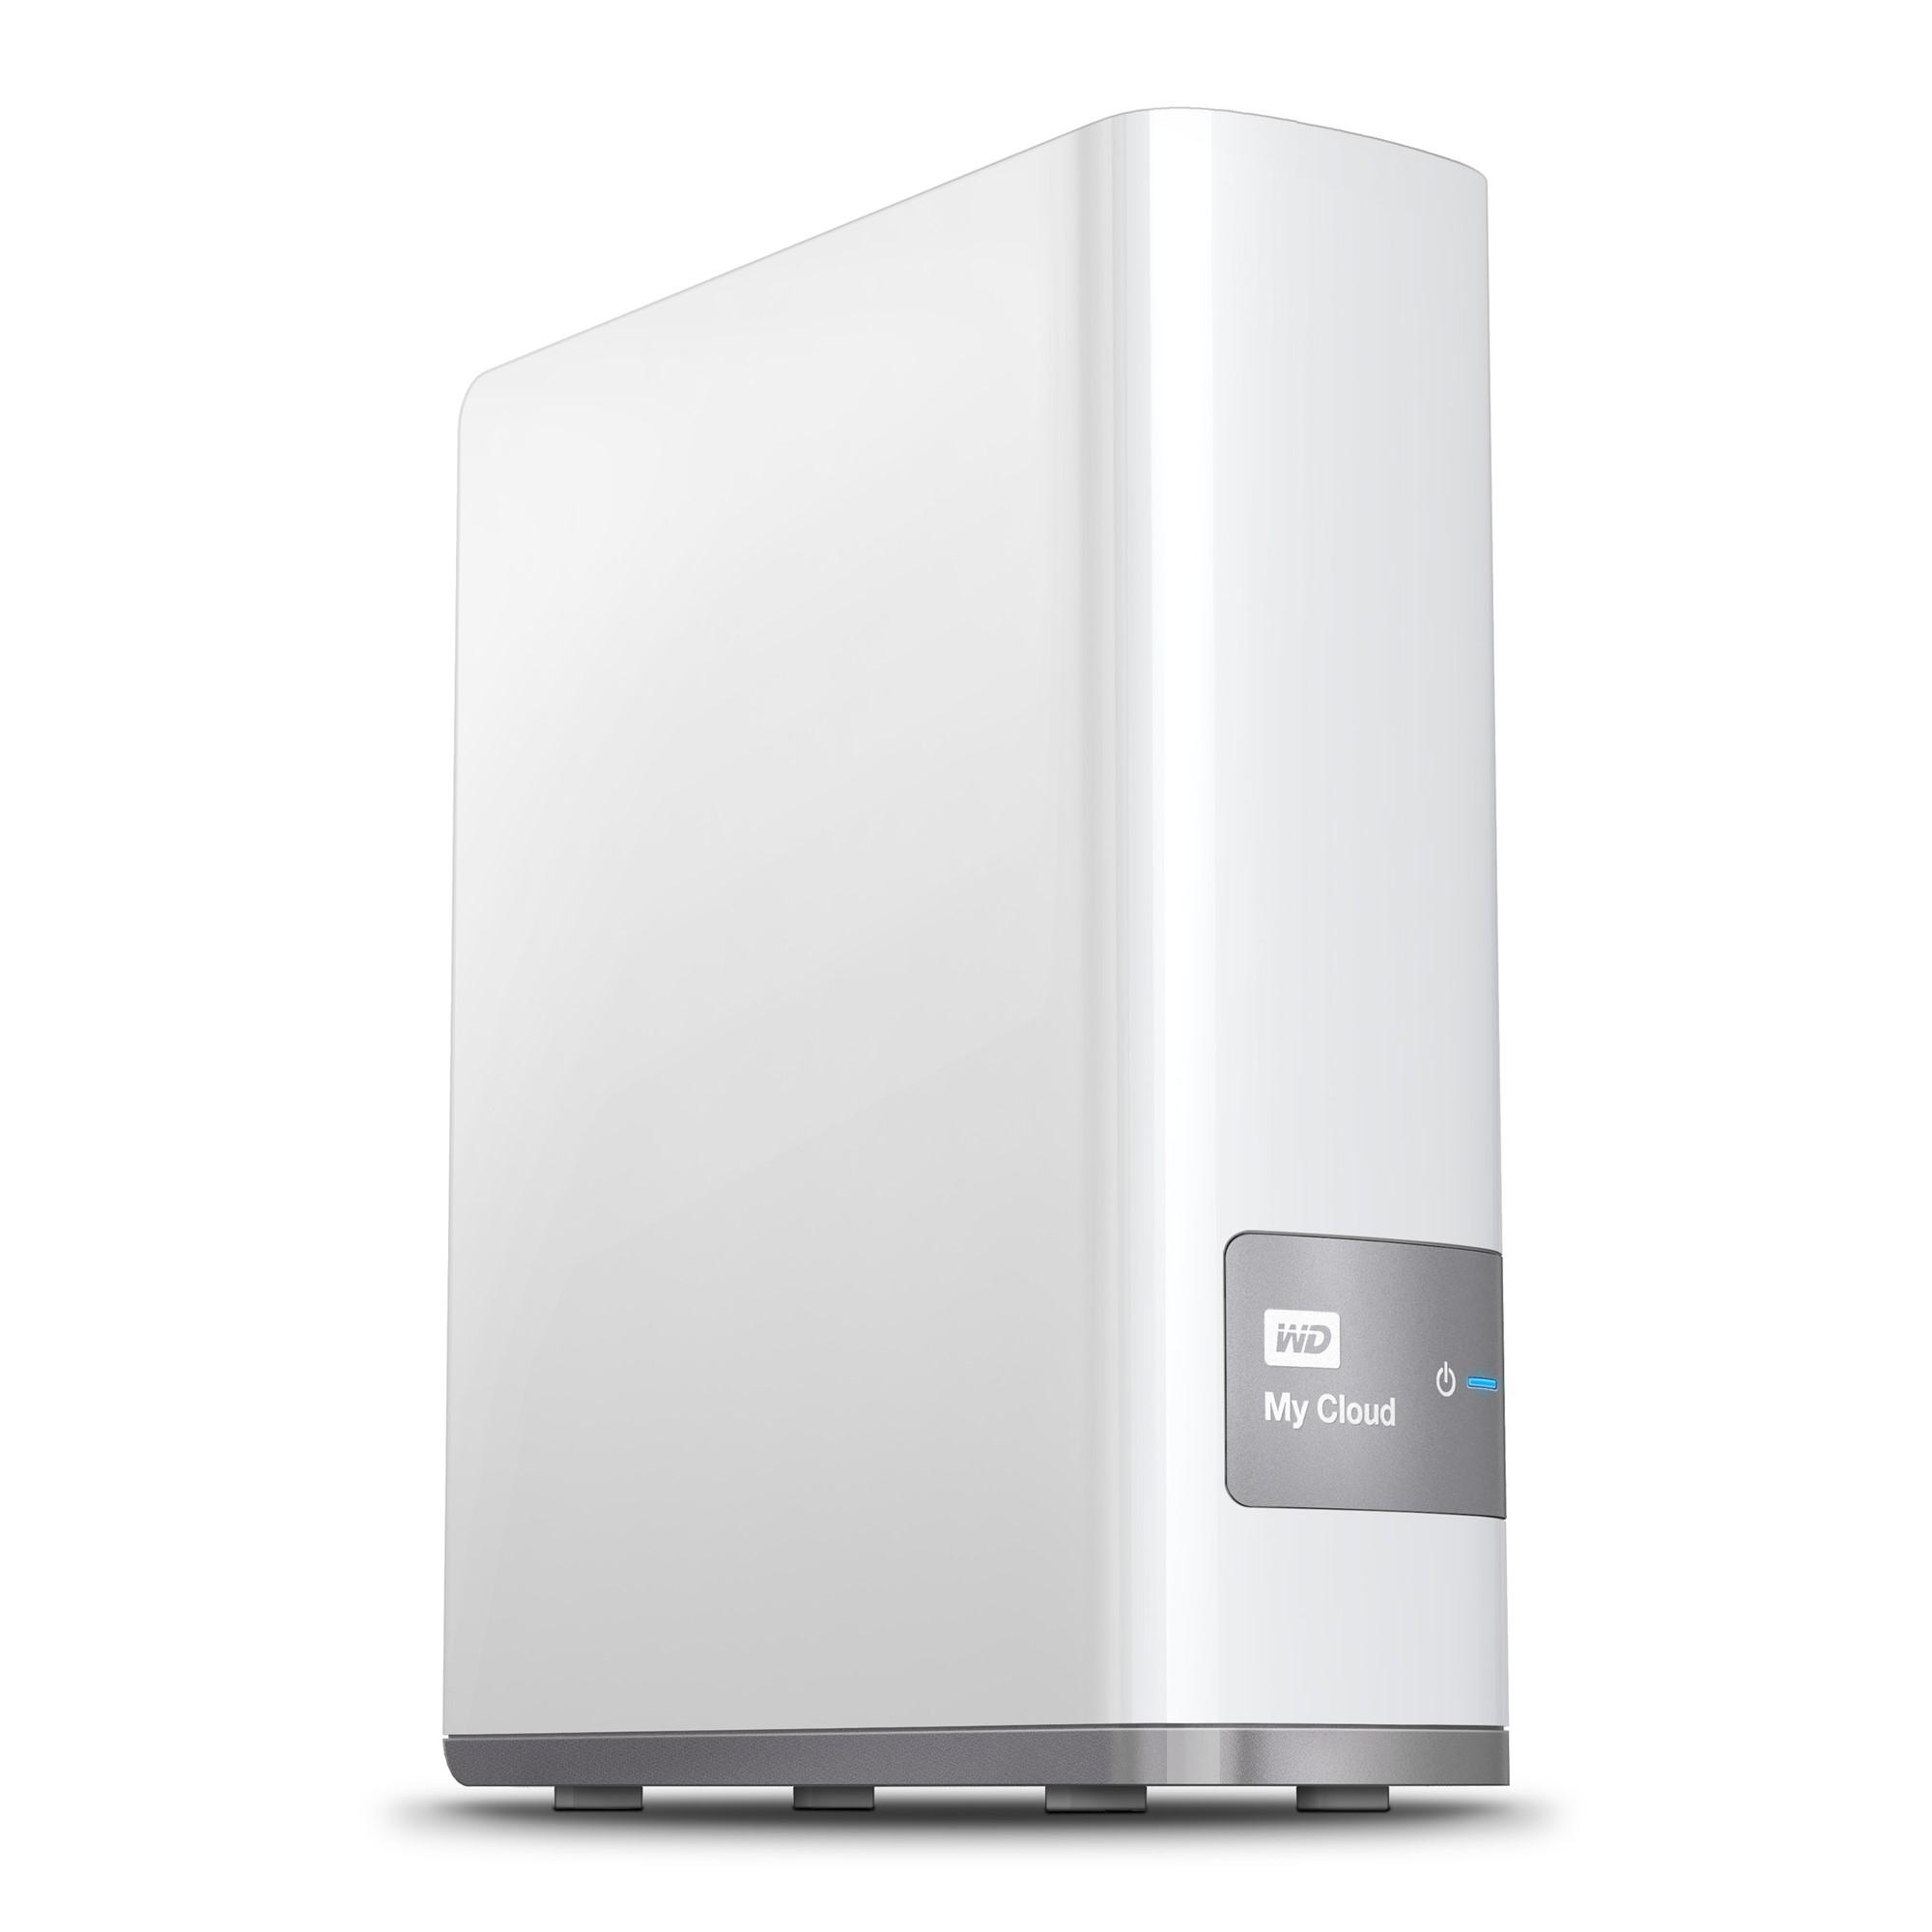 Western Digital My Cloud 3TB Ethernet LAN White personal cloud storage device